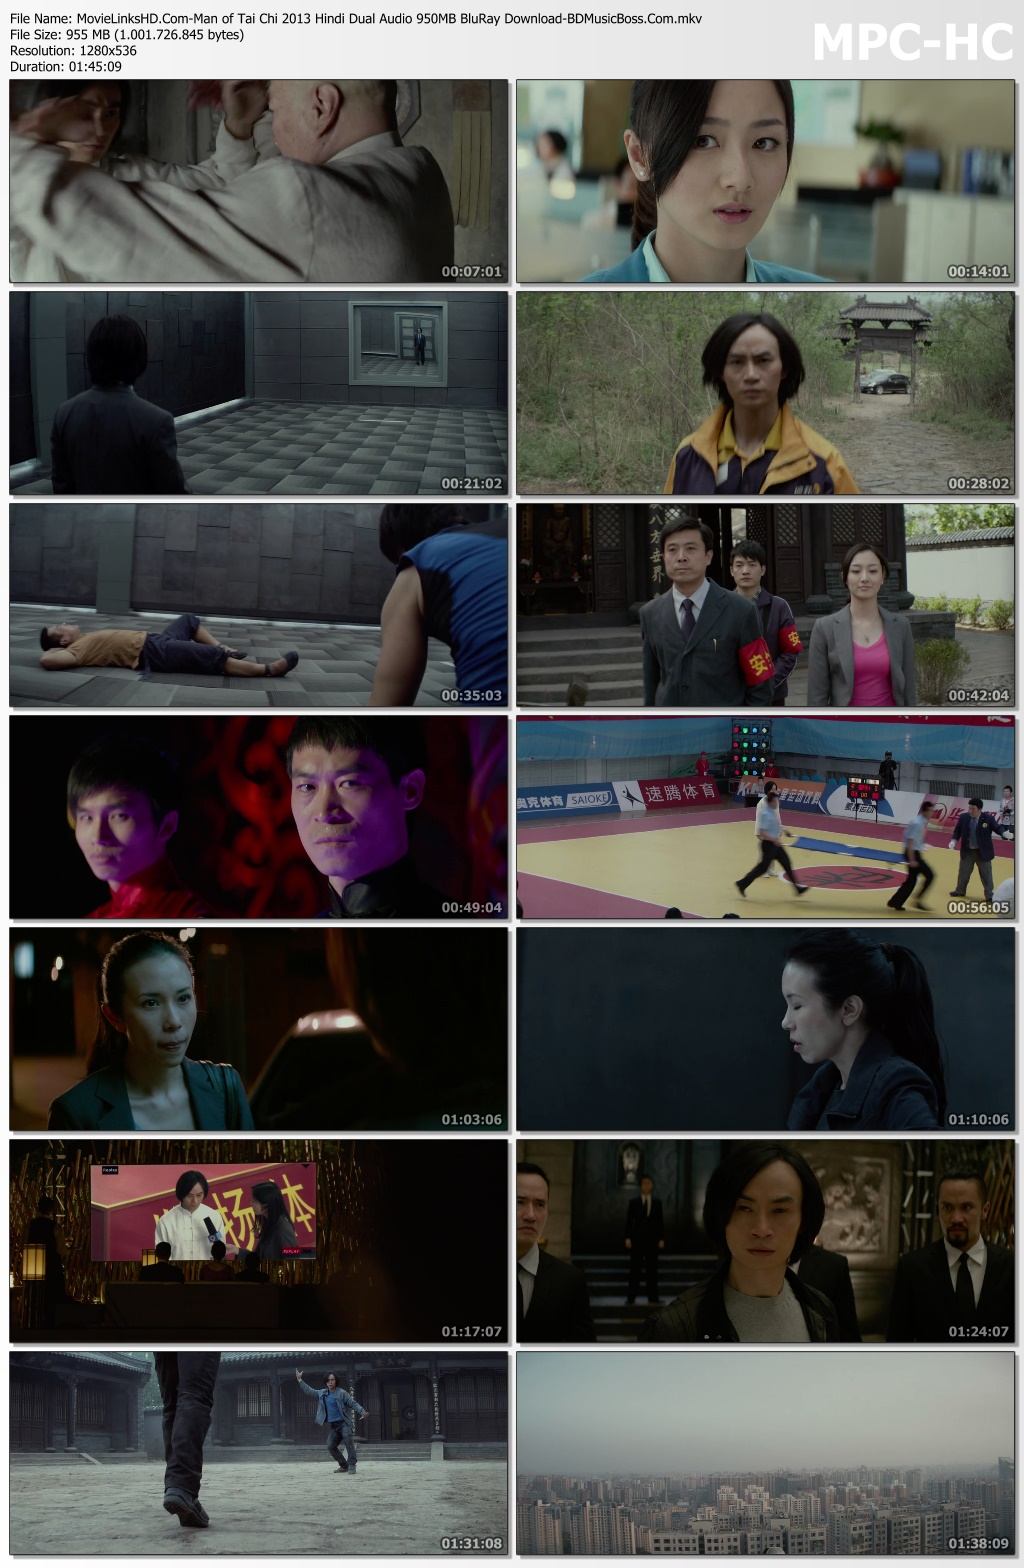 Movie-Links-HD-Com-Man-of-Tai-Chi-2013-Hindi-Dual-Audio-950-MB-Blu-Ray-Download-BDMusic-Boss-Com-mkv